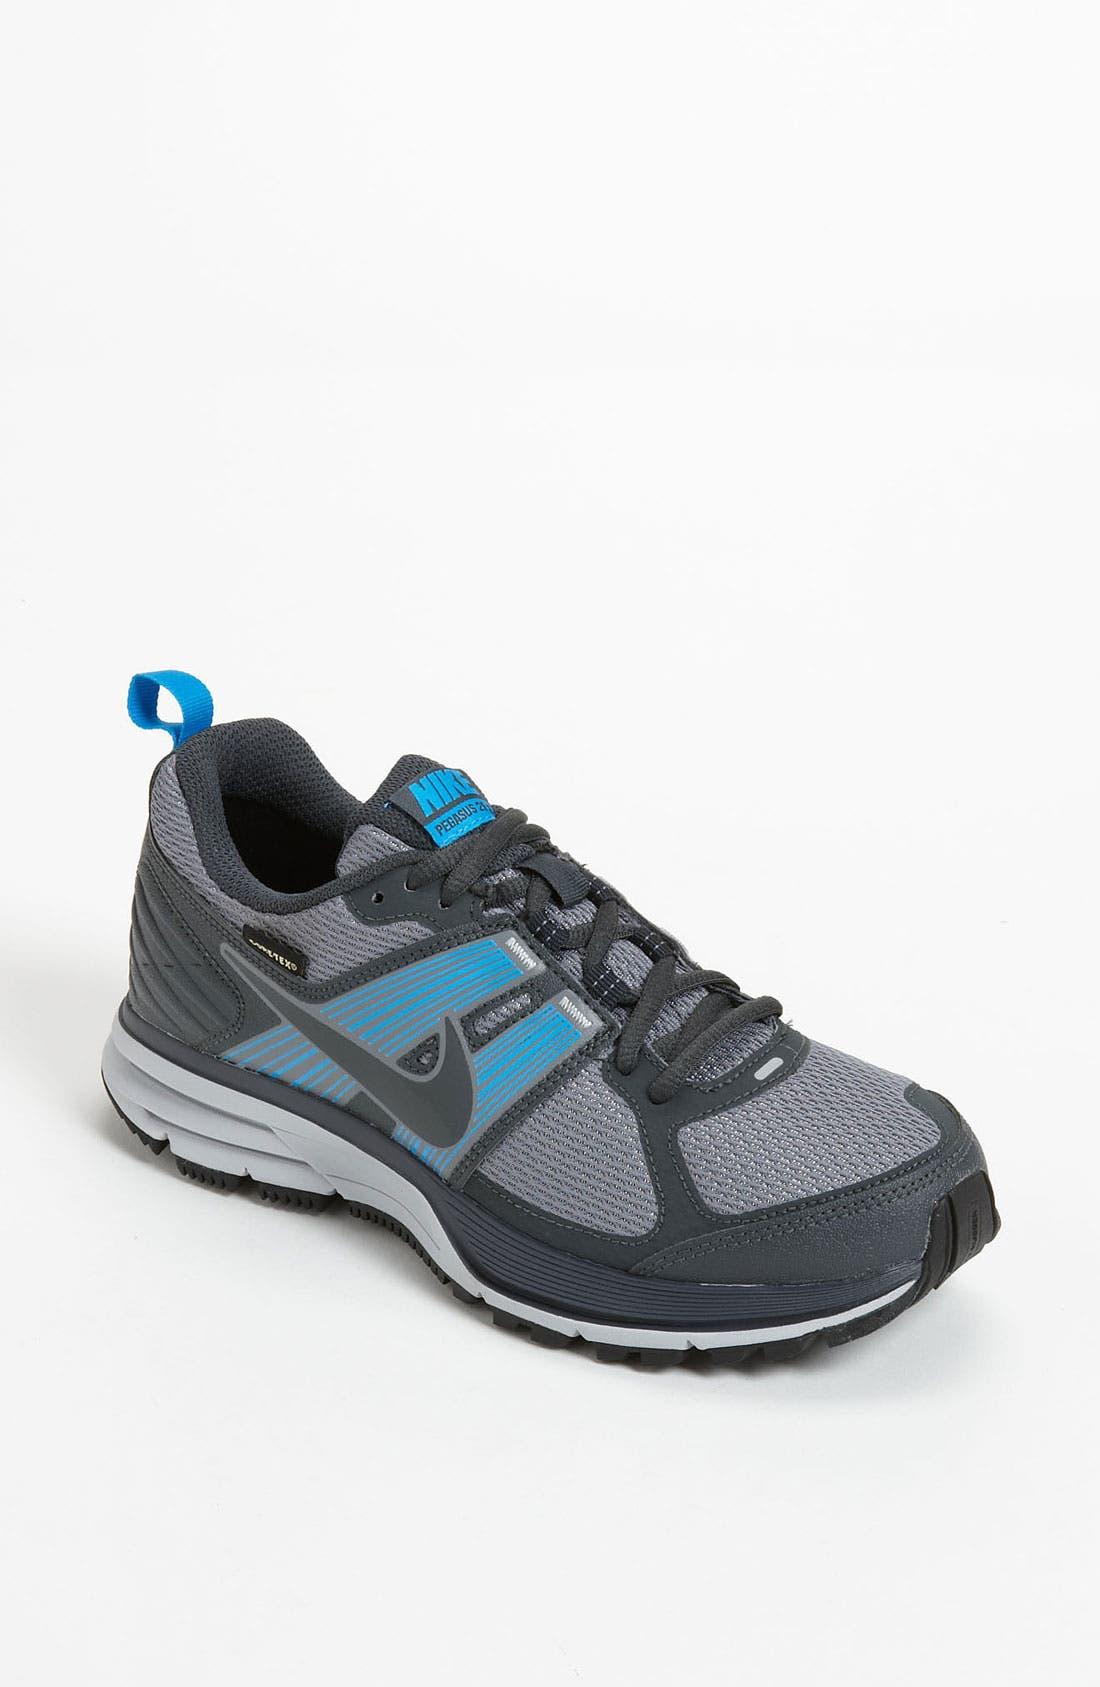 Alternate Image 1 Selected - Nike 'Air Pegasus 29+ GTX' Running Shoe (Women)